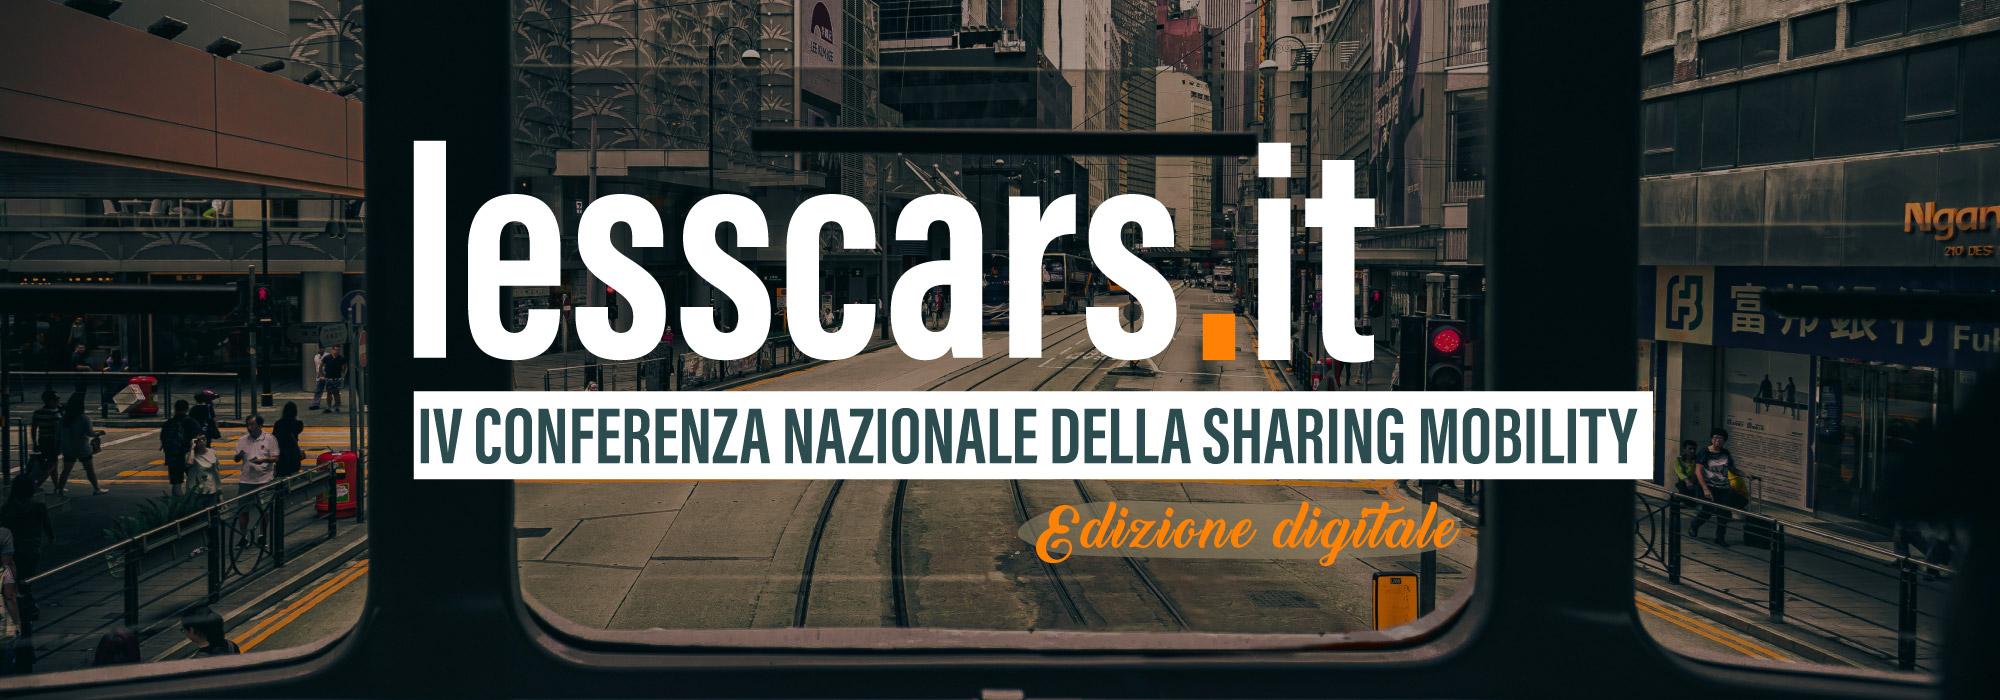 Lesscars